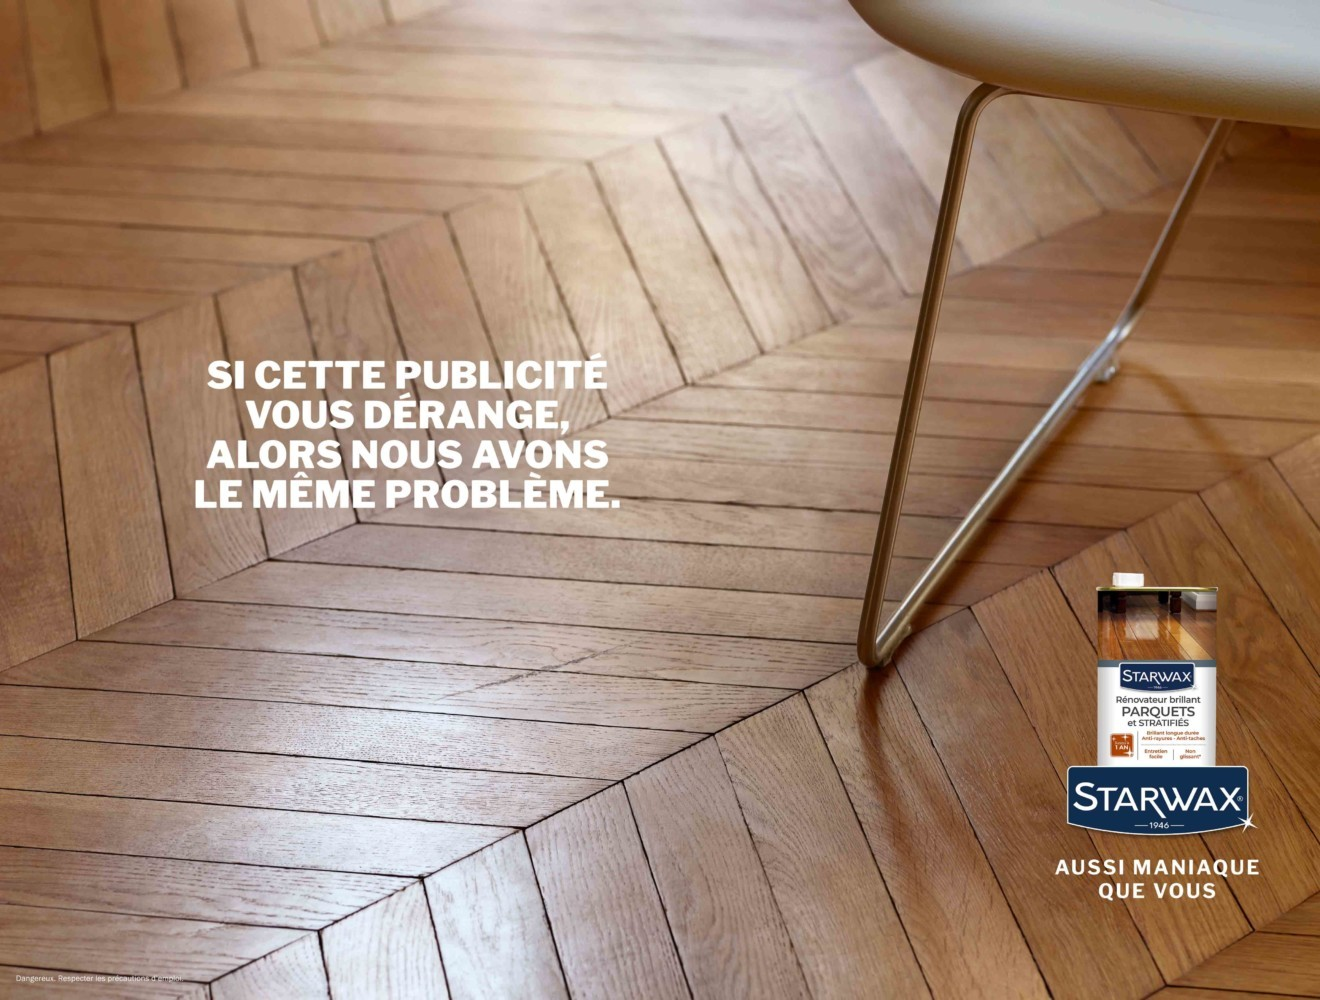 Jérôme Galland | Commissioned